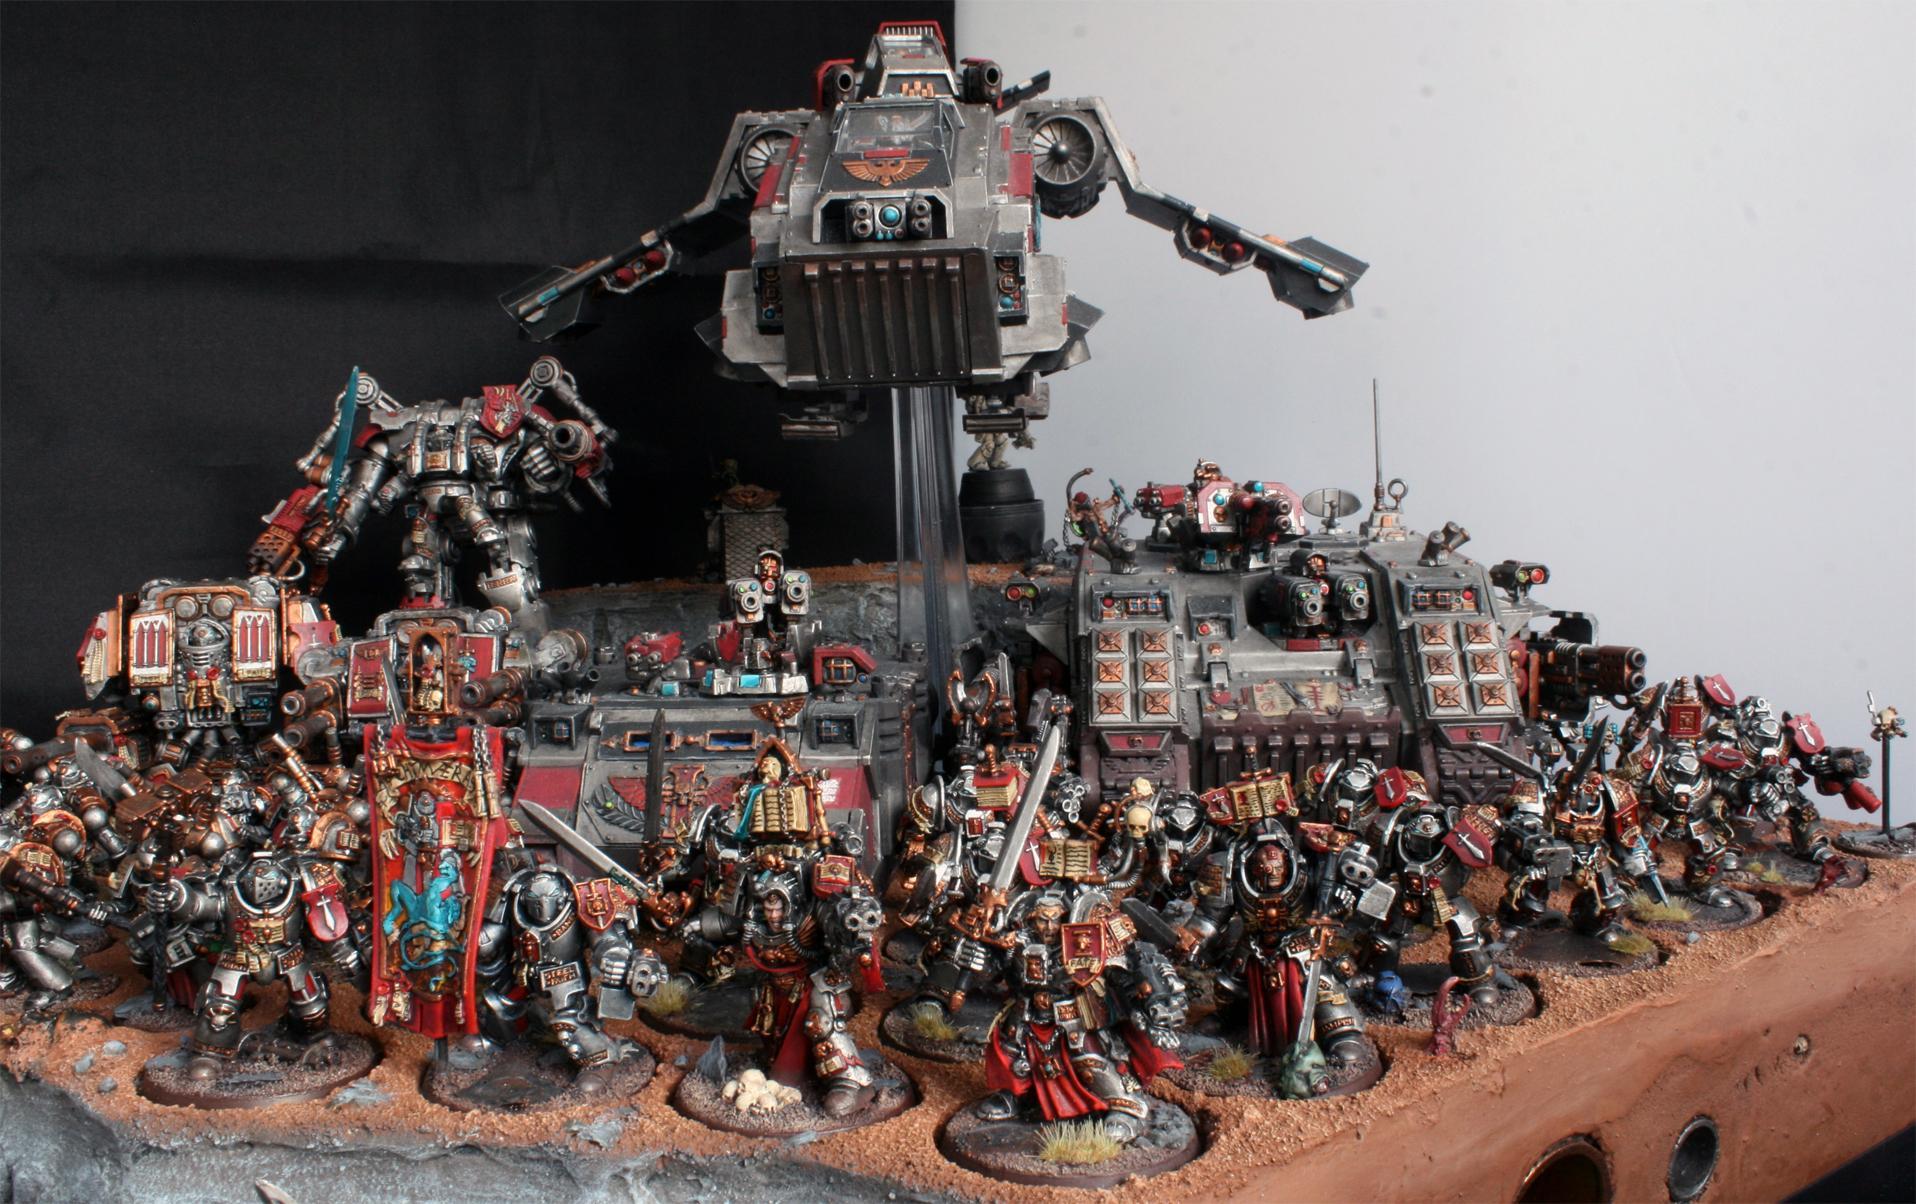 Arkaal, Display, Dreadknigh, Dreadnought, Forge, Grey, Hector, Henchmen, Inquisitor, Knights, Land, Librarian, Lok, Raider, Raven, Rex, Rhino, Solomon, Stern, Storm, Tray, World